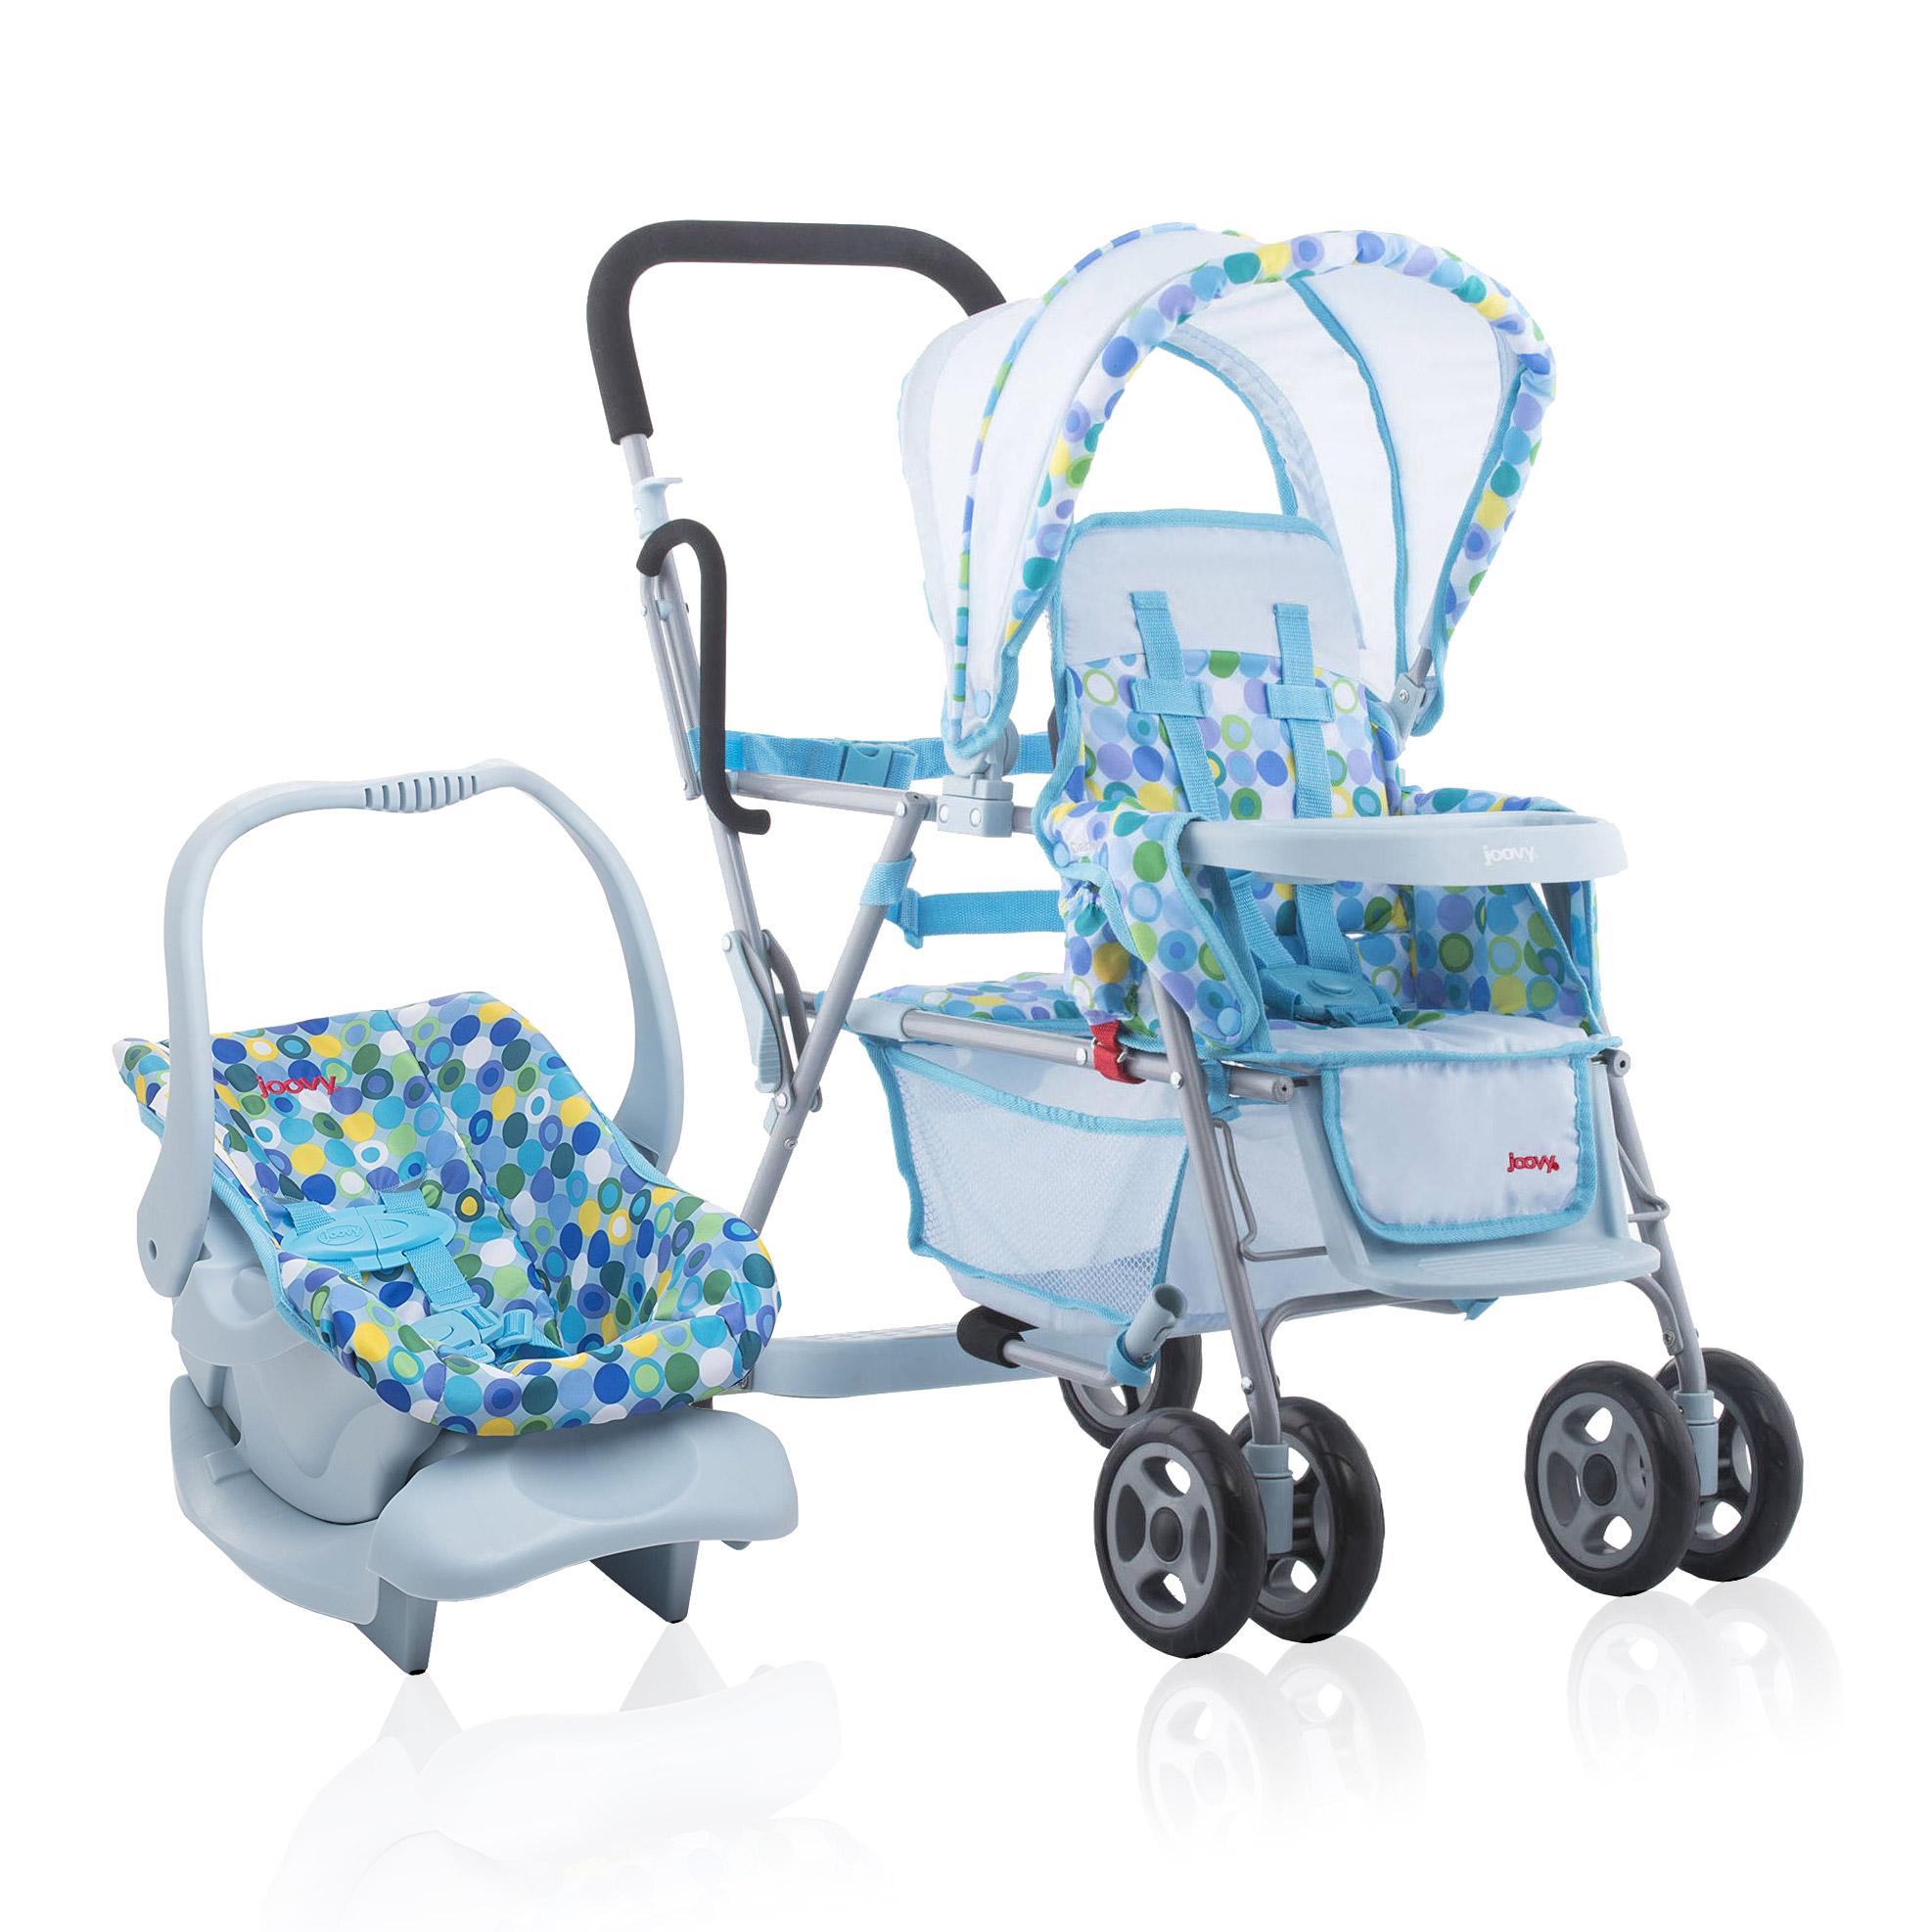 Joovy 3 Toy Doll Caboose Pretend Play Children Stroller Car Seat Blue Dot